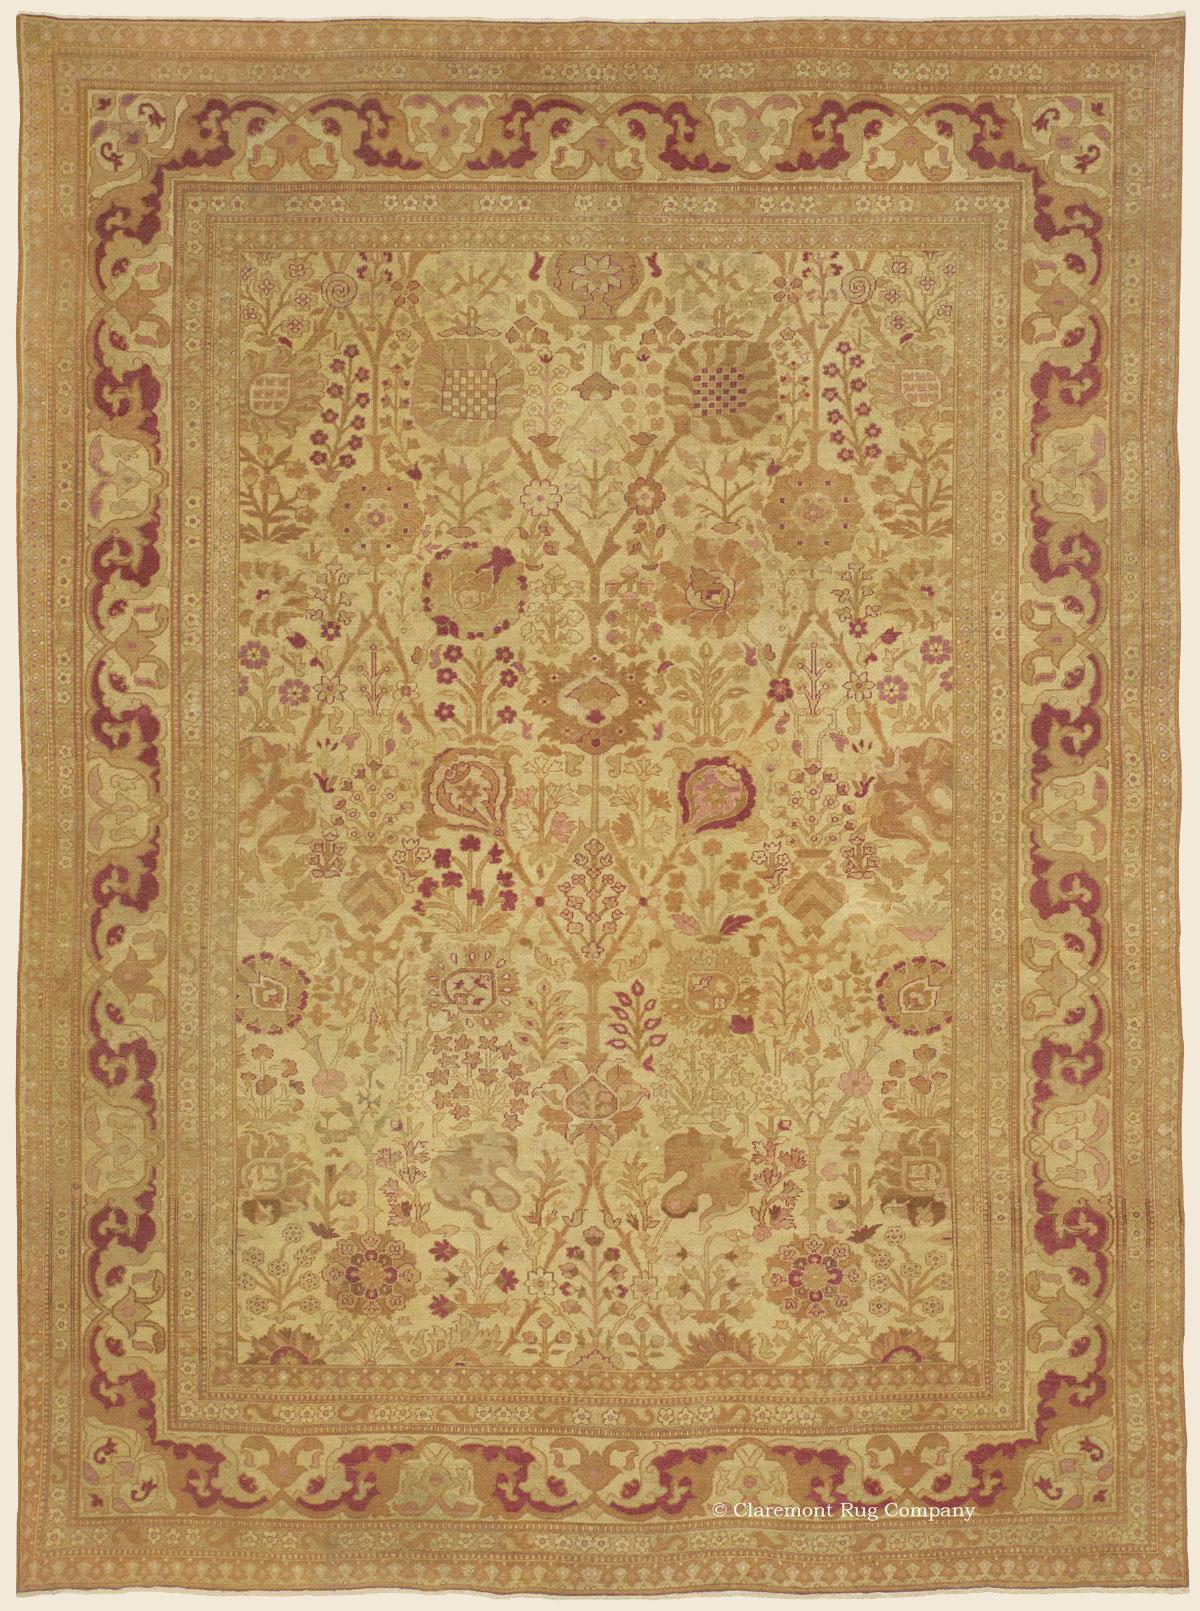 Amritsar Northern India Antique Rug Claremont Rug Company